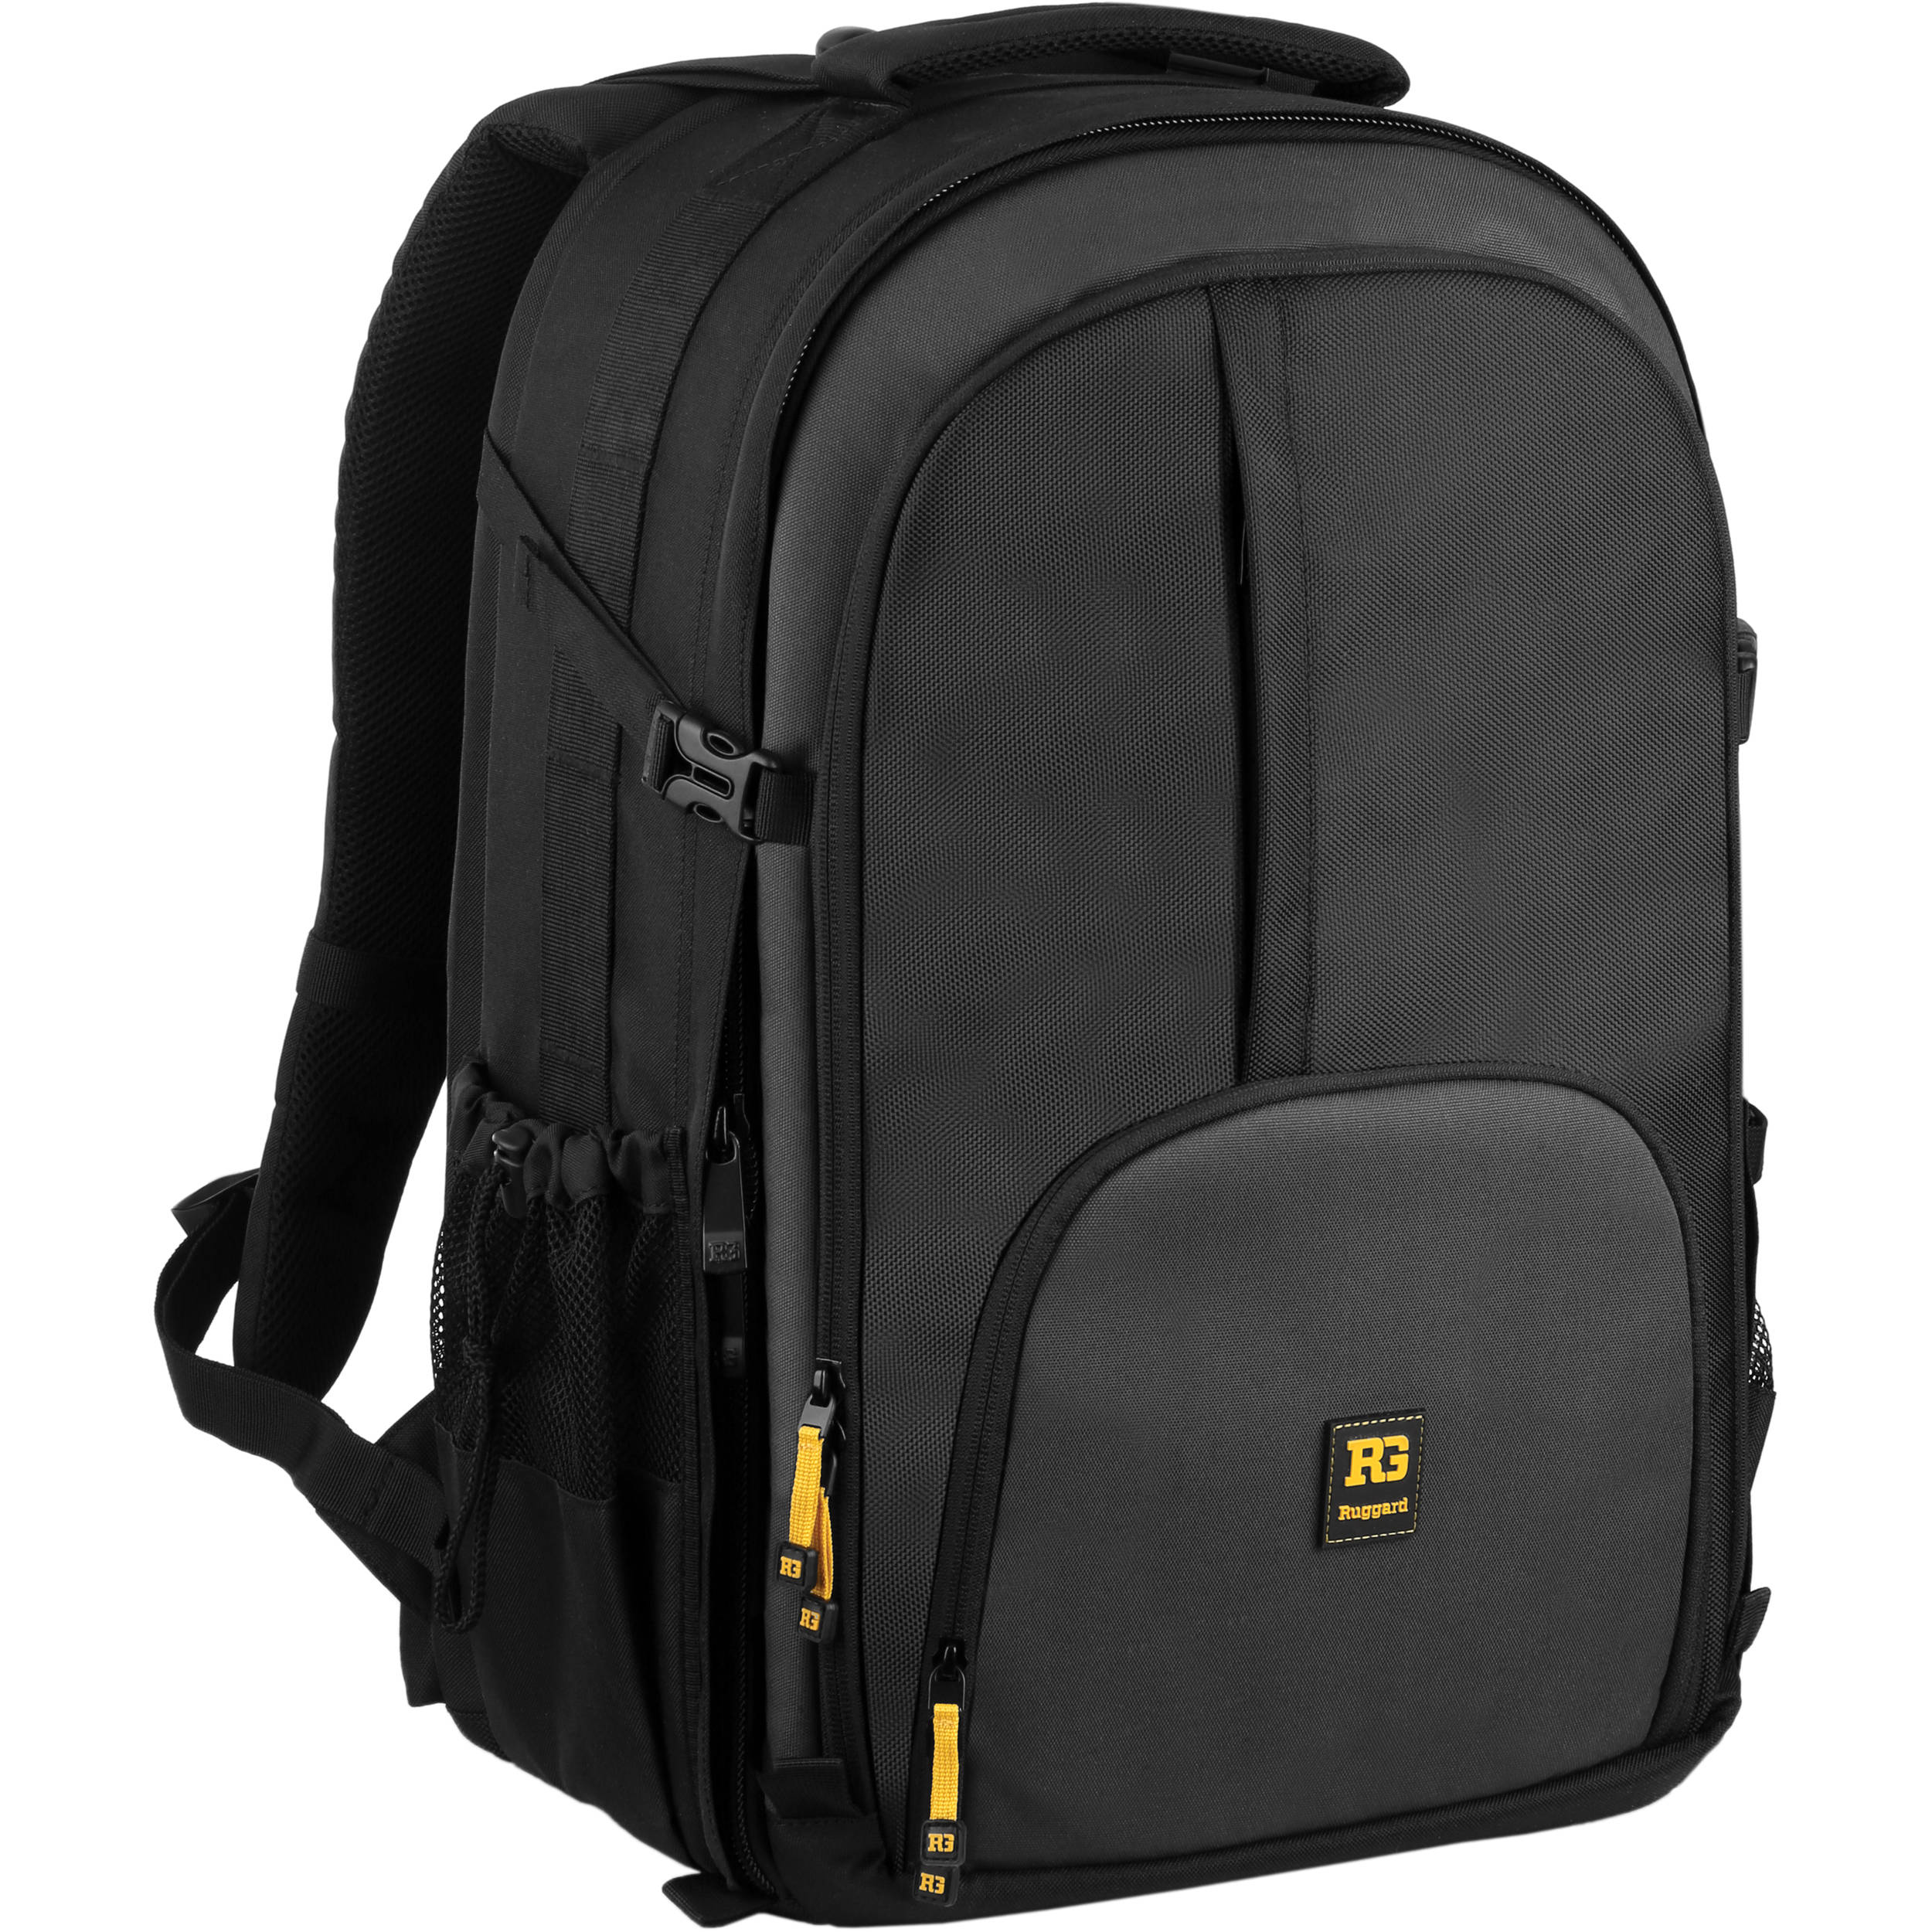 Ruggard Thunderhead 75 DSLR & Laptop Backpack PBB-275B B&H